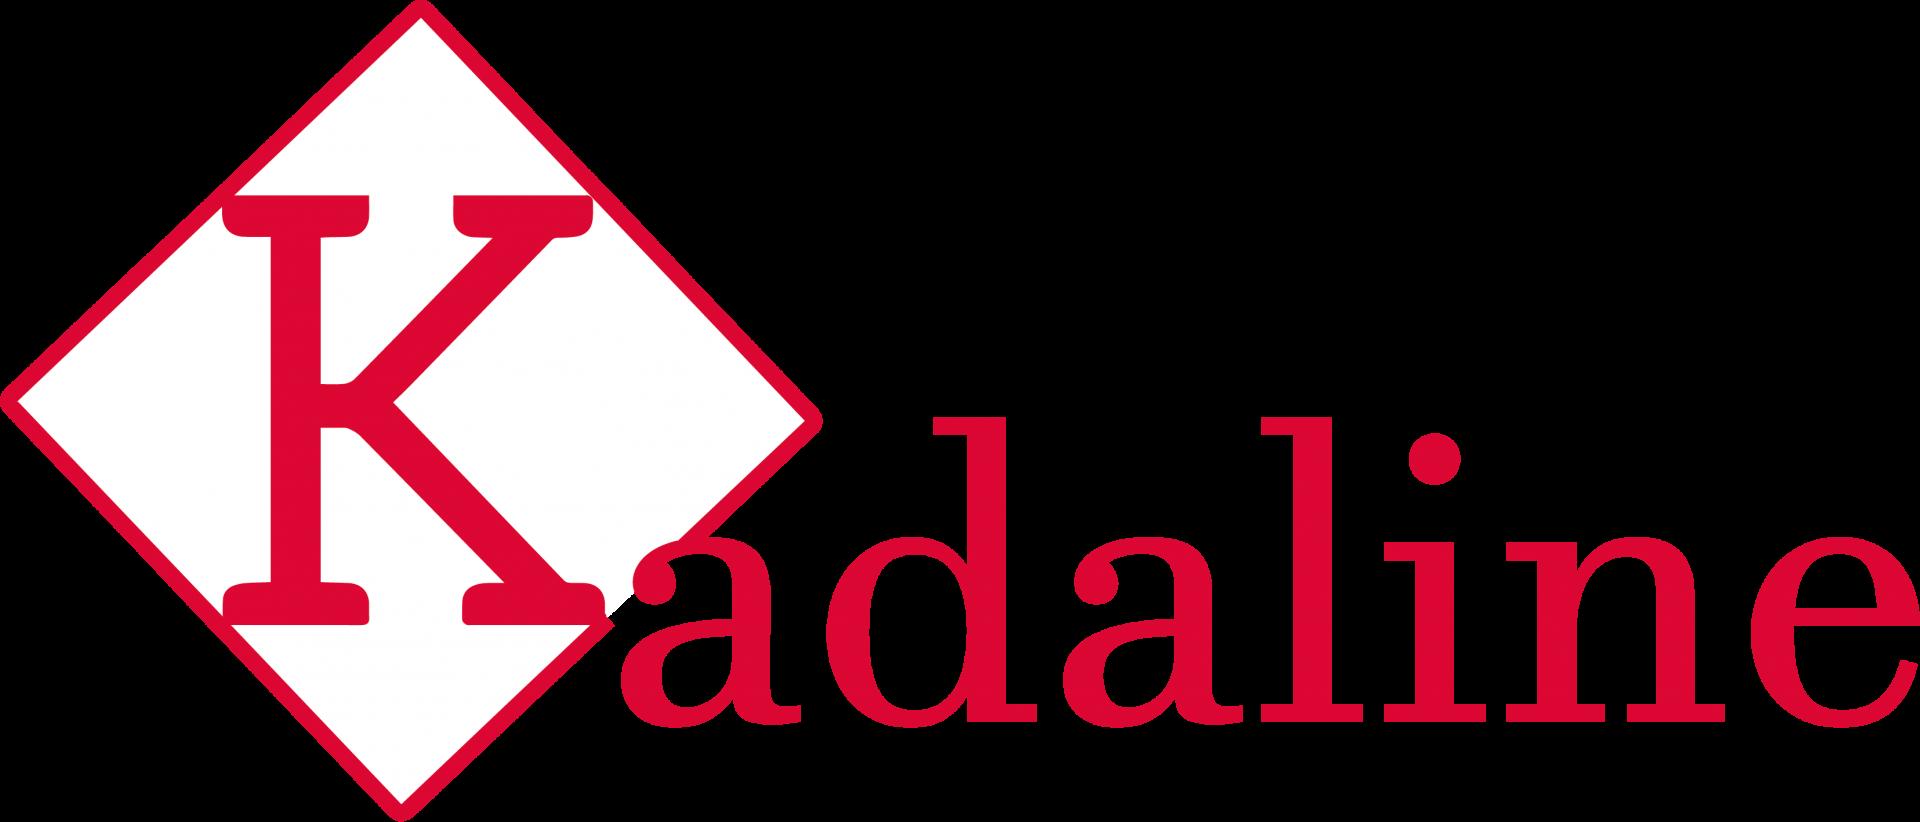 Editions Kadaline